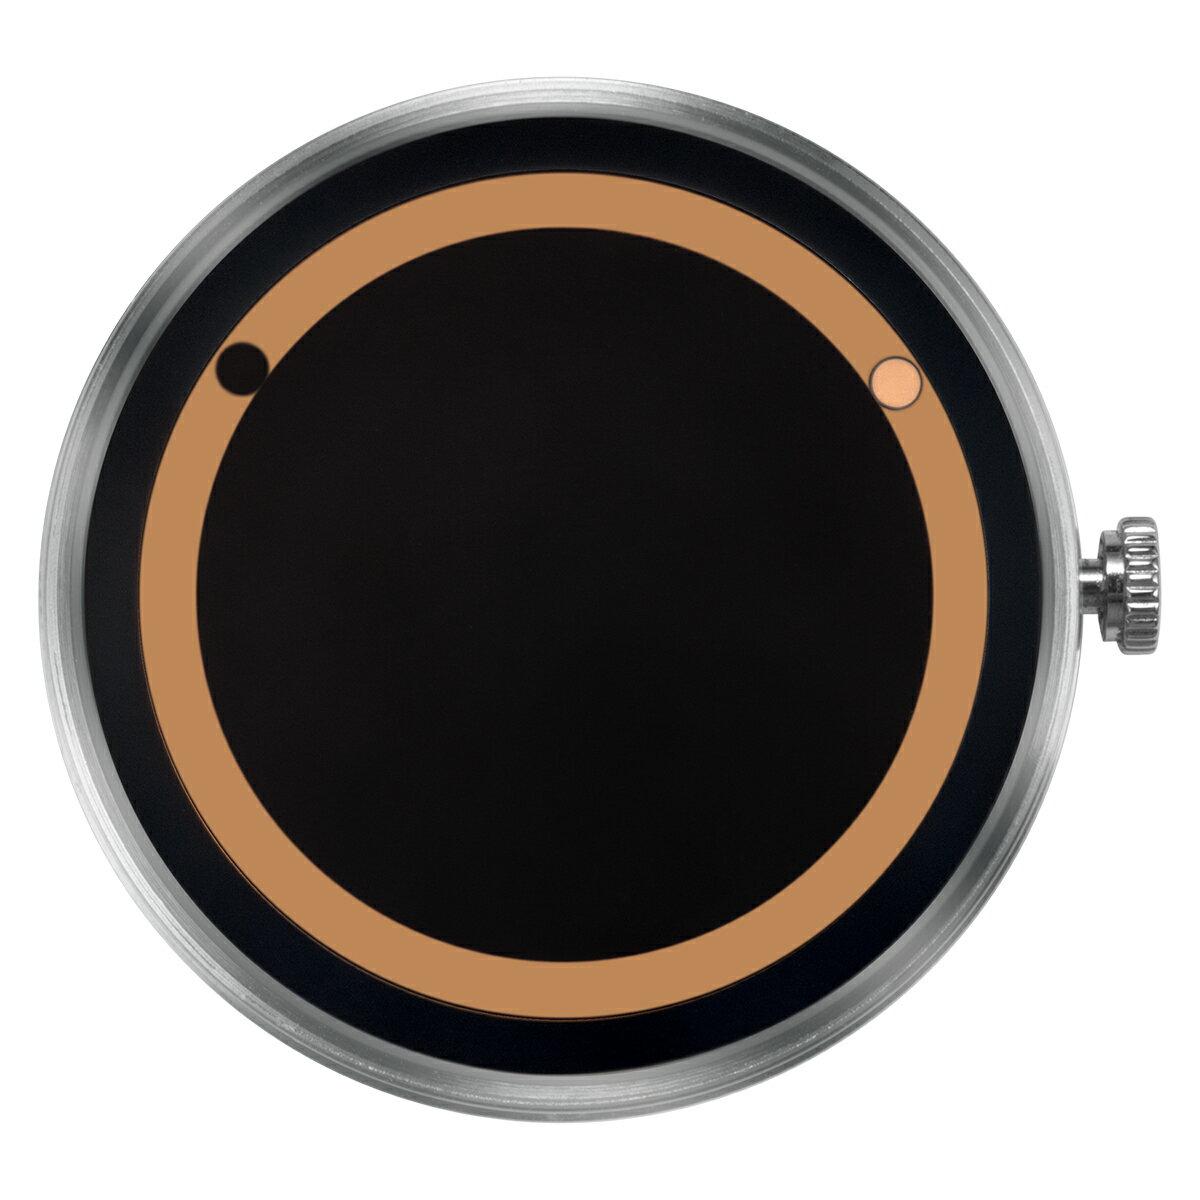 ZEROO 交換用クロックボディ ZEROO PLANET ECLIPSE ゼロ 電池式クォーツ 腕時計 [M13029]